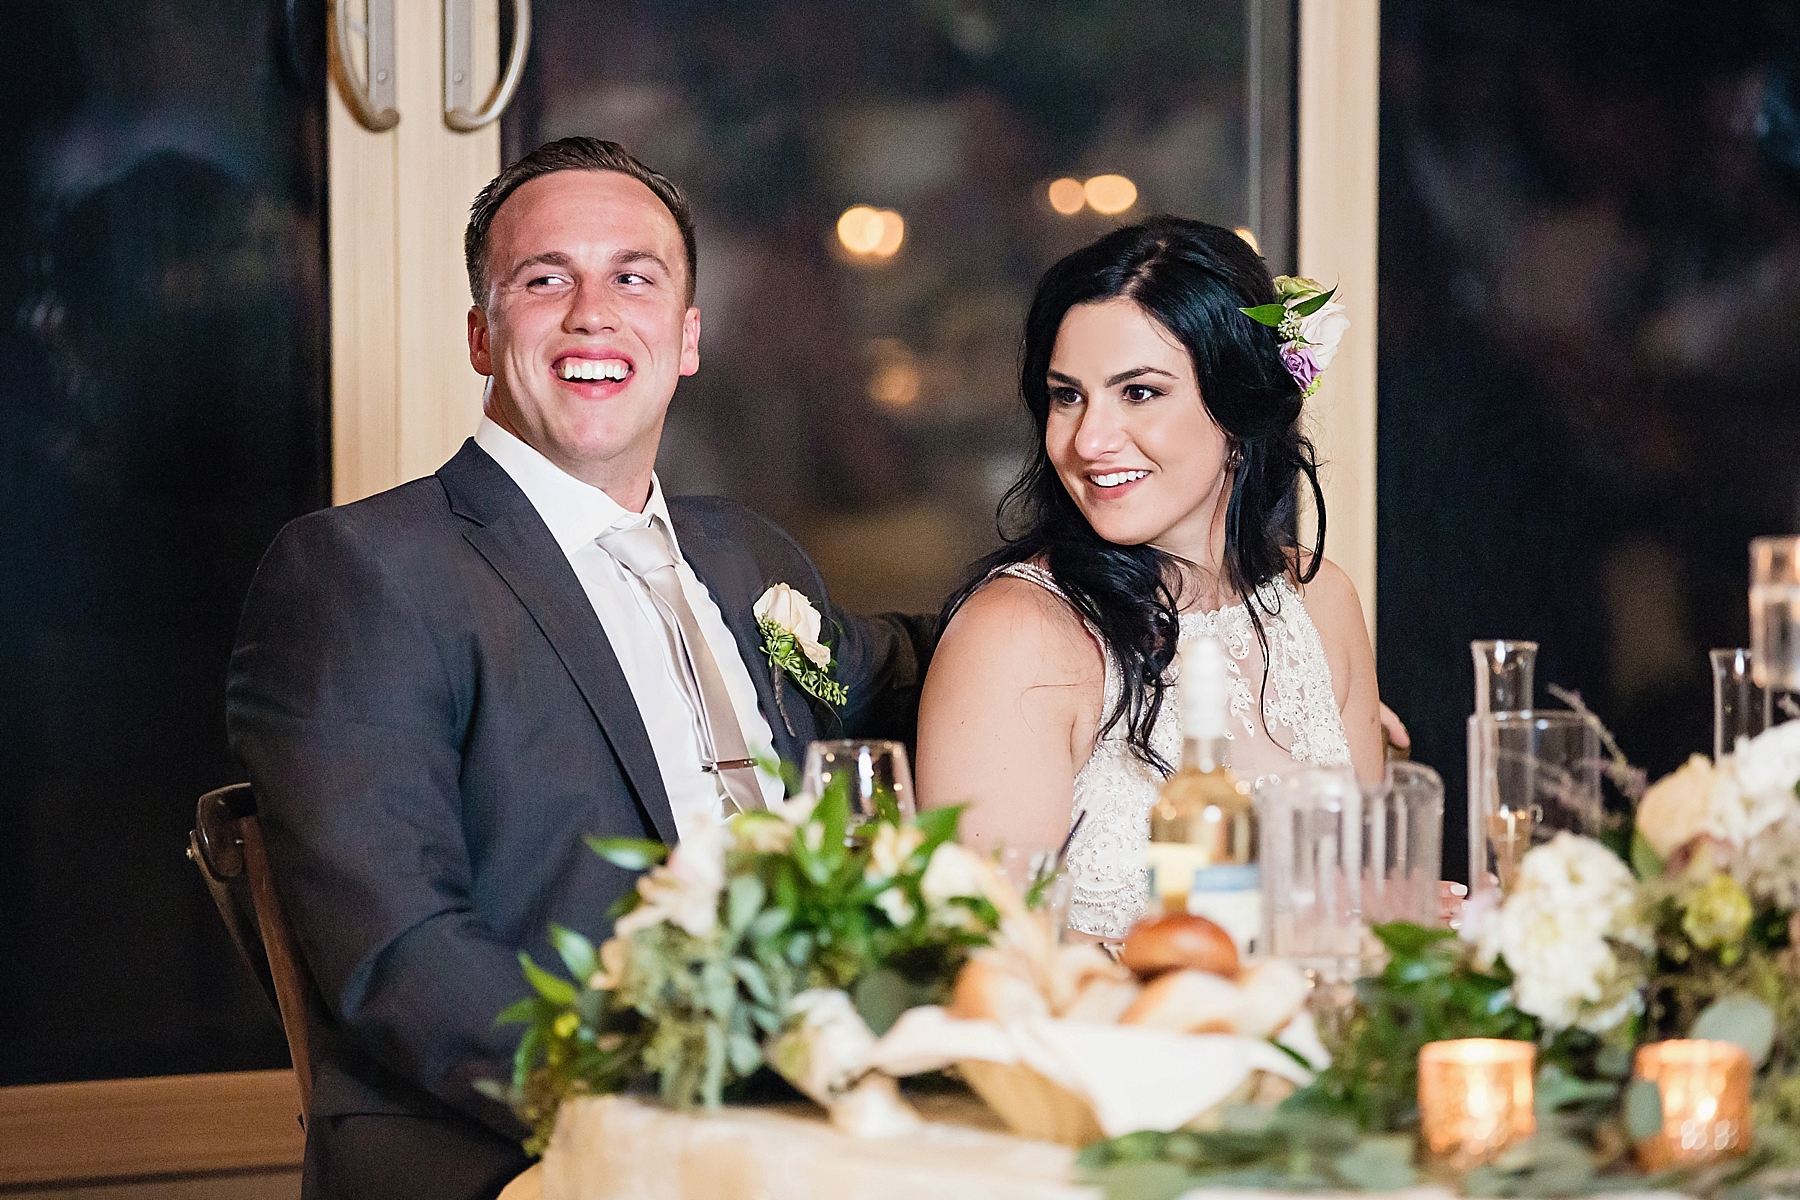 windsor-wedding-photographer-sprucewood-shores-winery-wedding-niagara-on-the-lake-wedding-photographer-eryn-shea-photography_0083.jpg